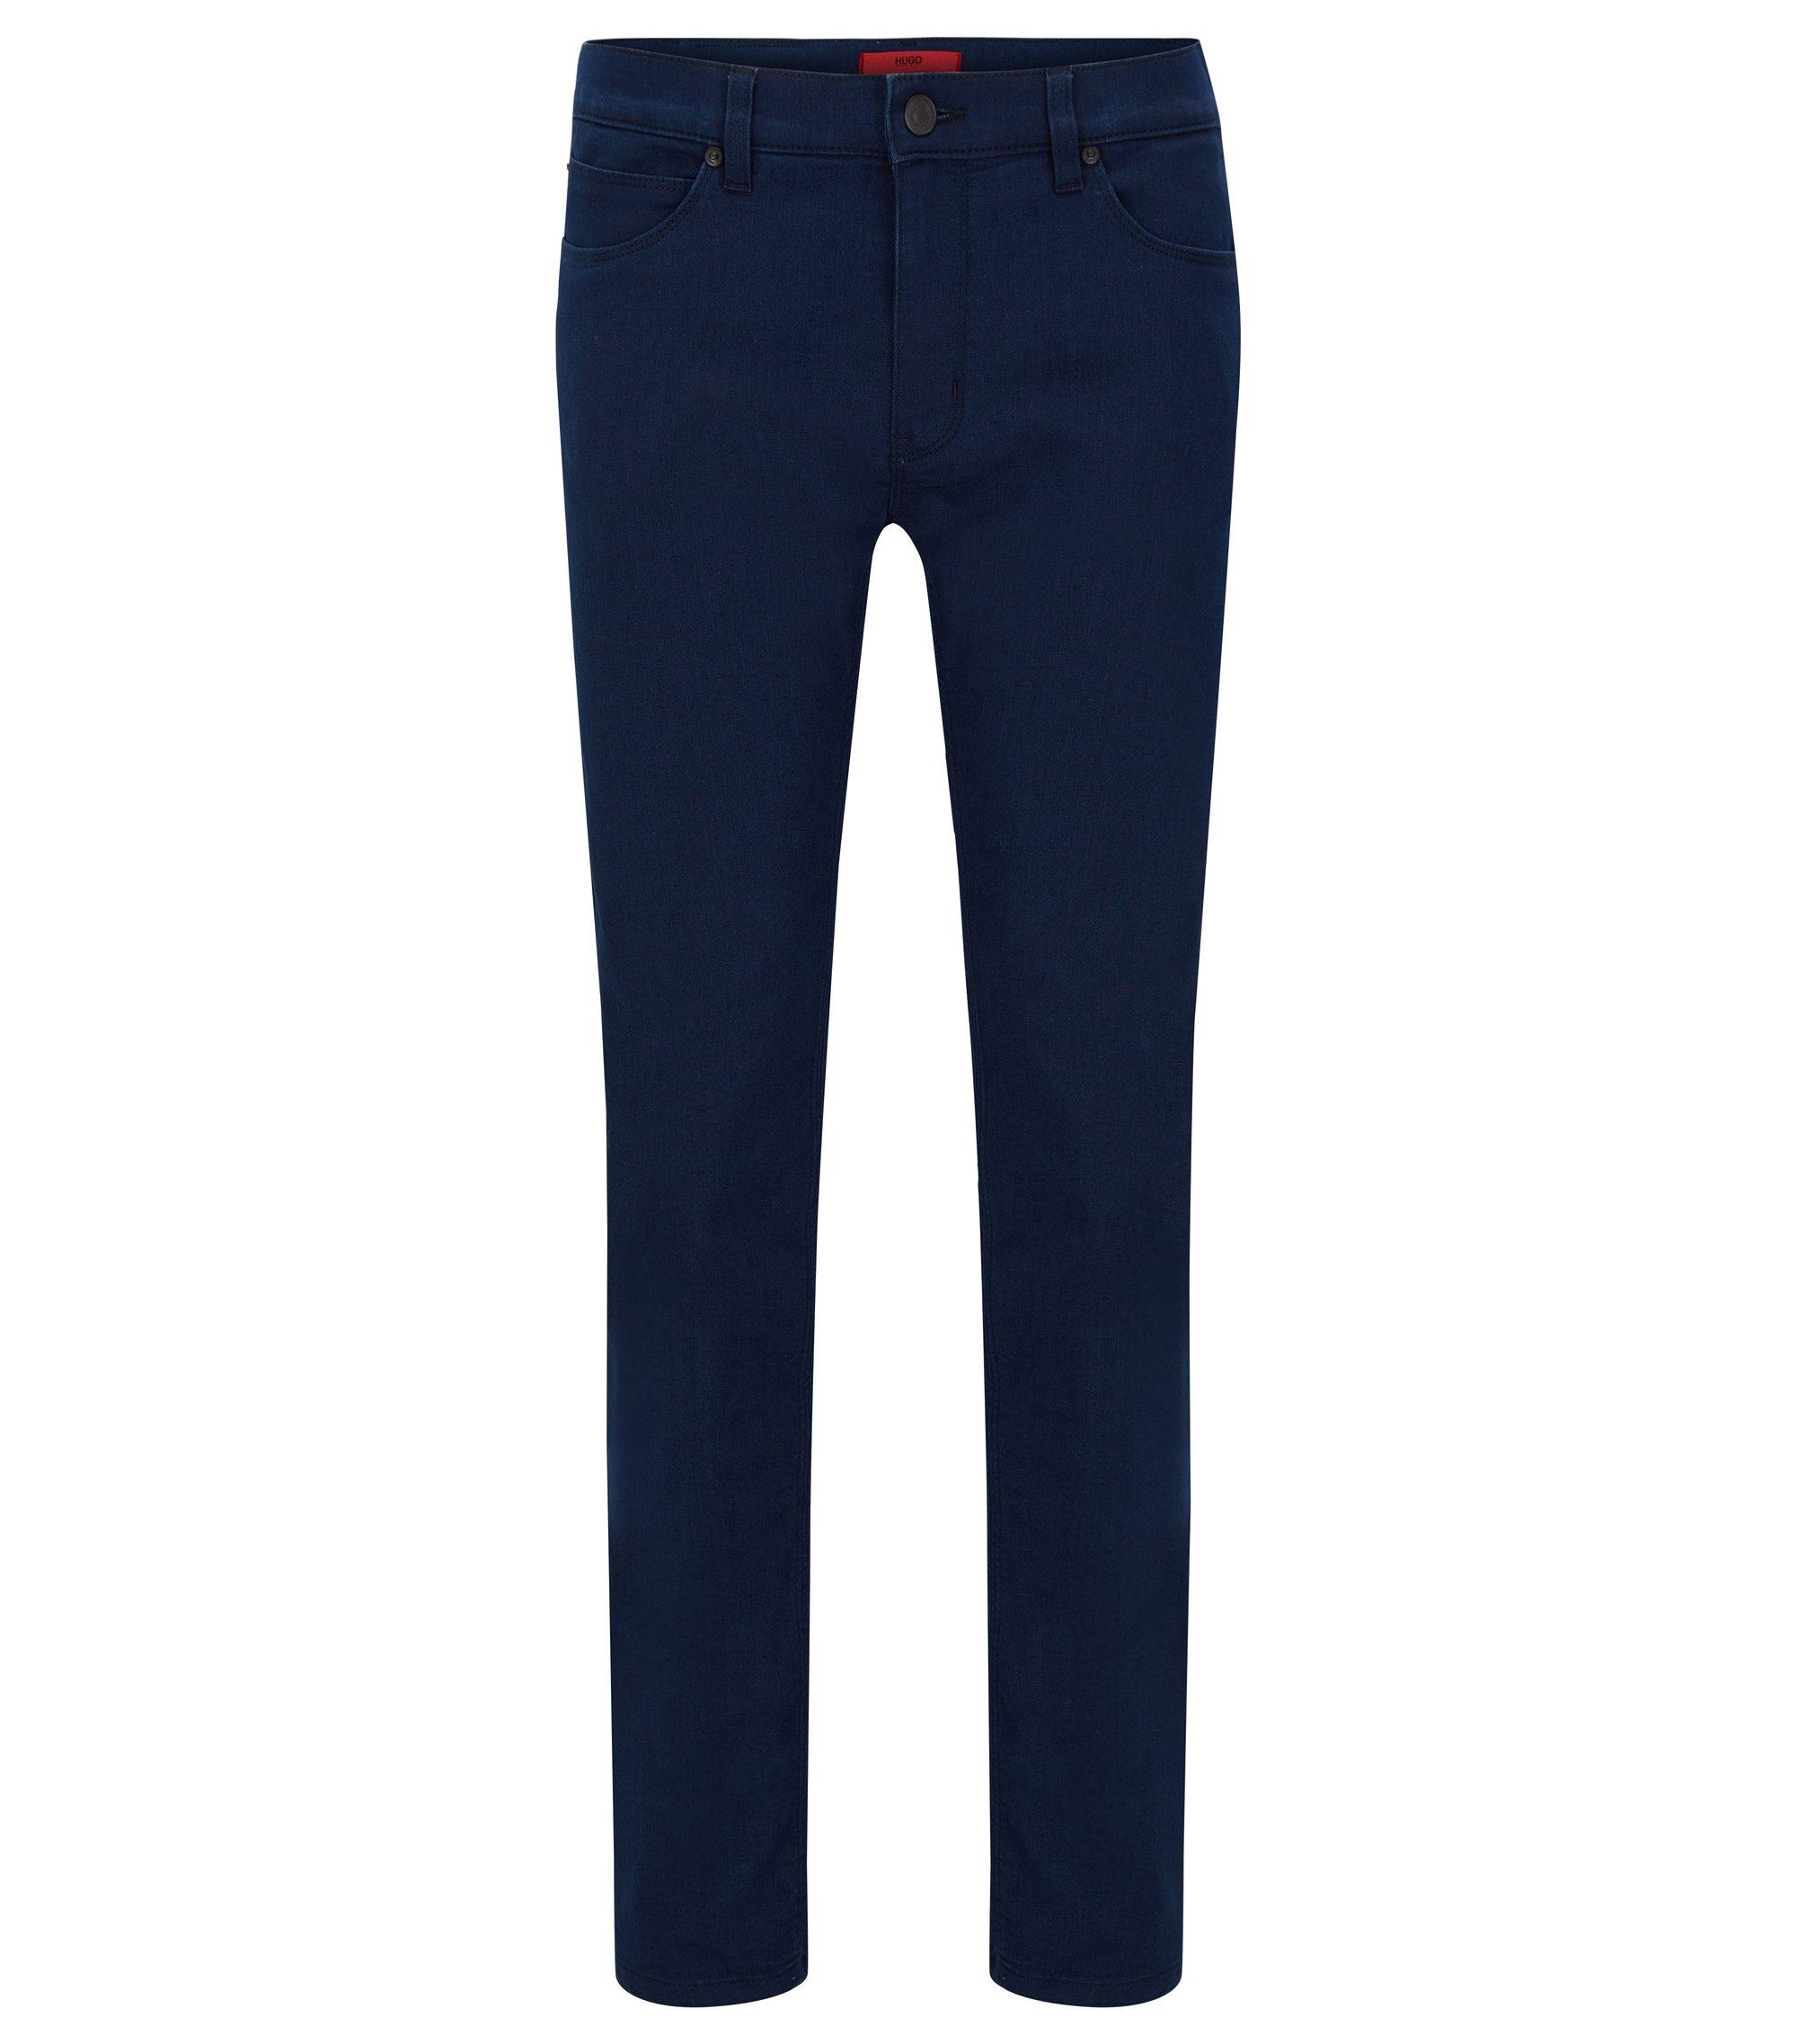 8 oz Stretch Cotton Jeans, Skinny Fit | Hugo 734, Dark Blue